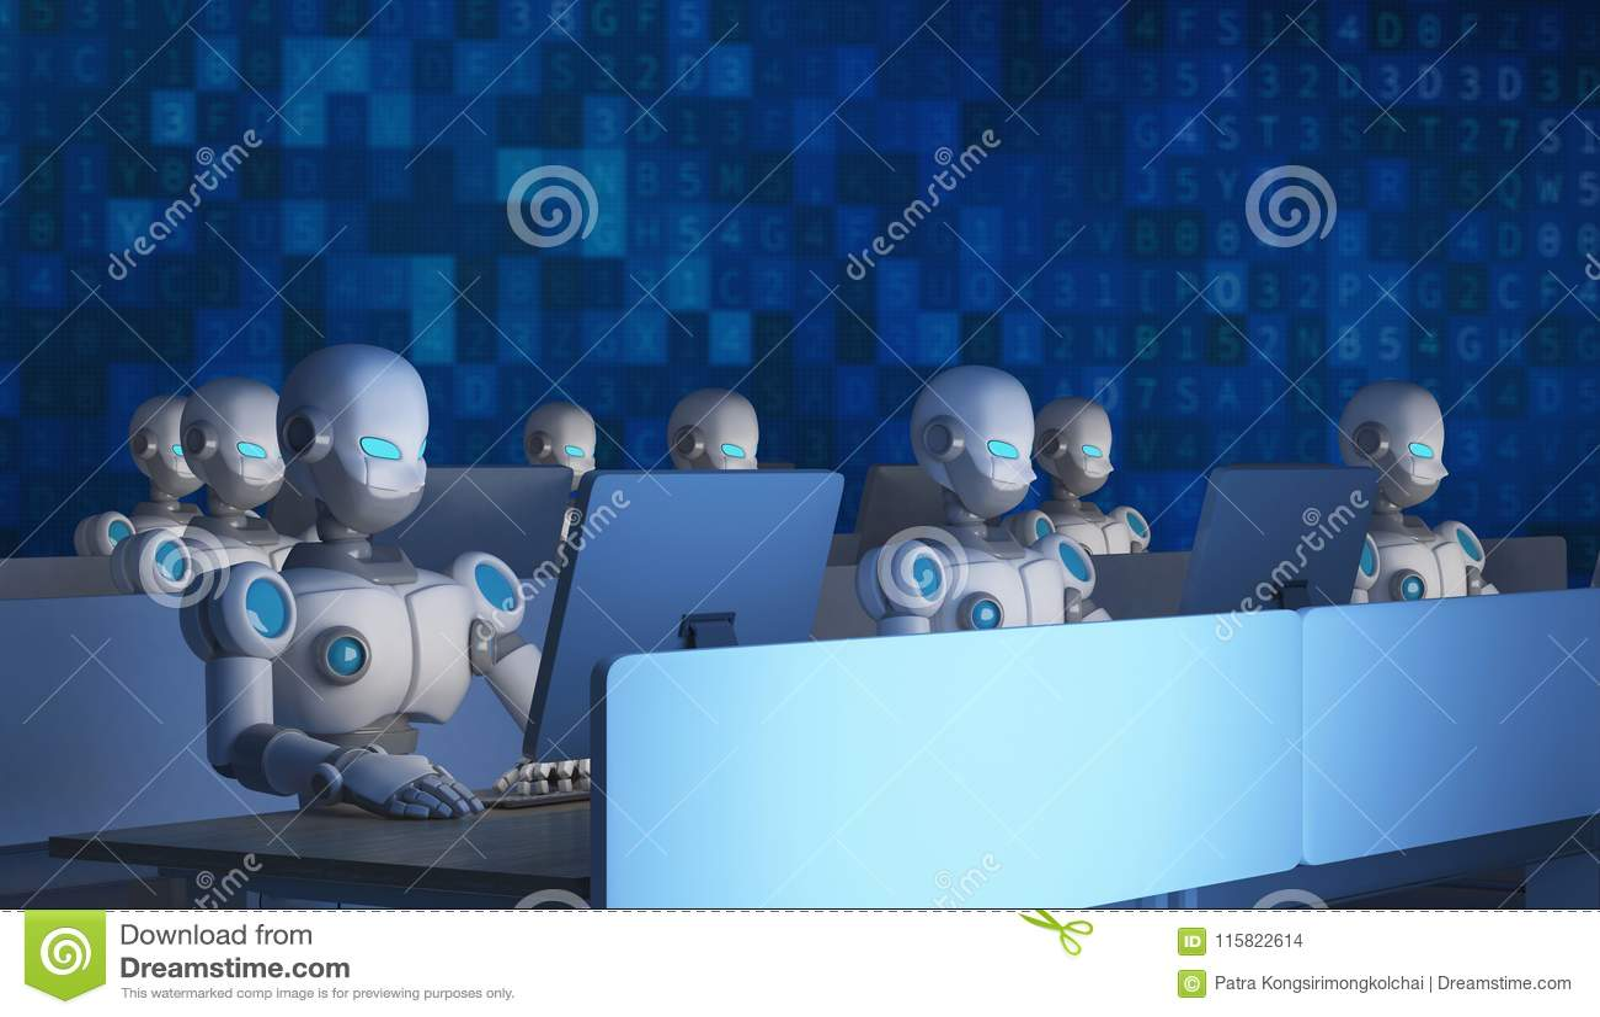 Groep robots die computers met gegevenscode met behulp van kunstmatig